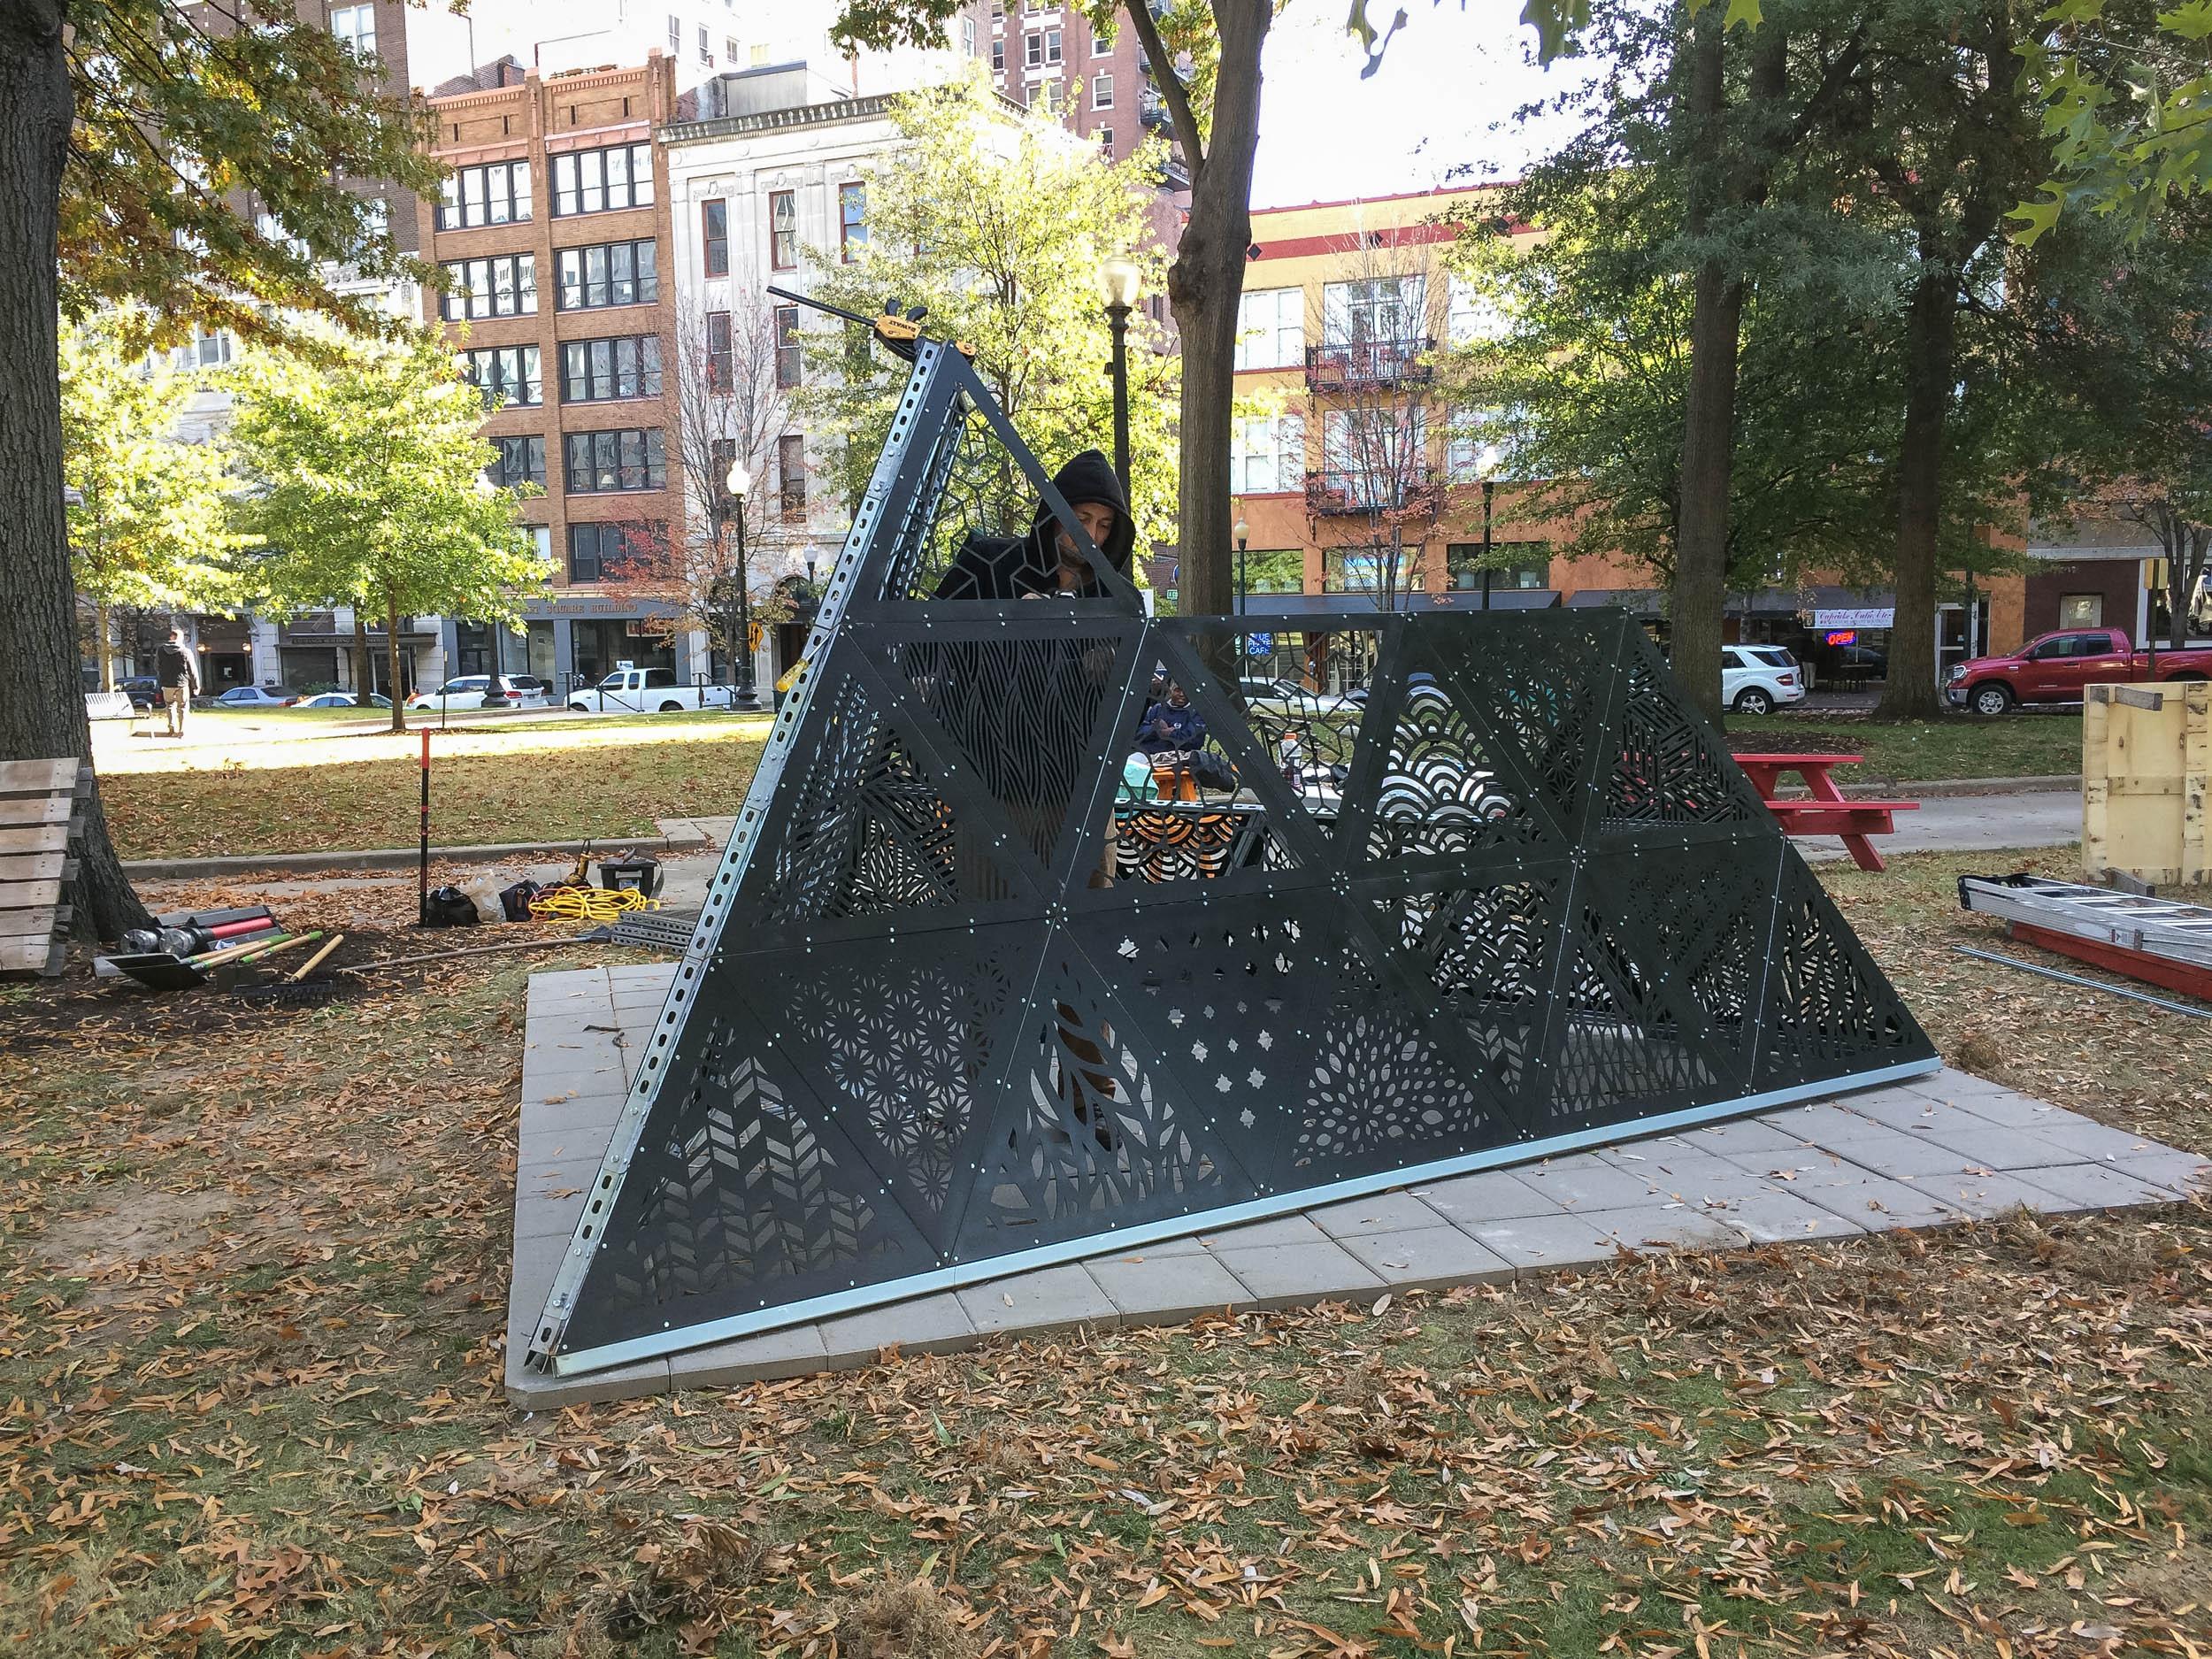 MOD 1 Tetrahedron Downtown Installation 0009.jpg